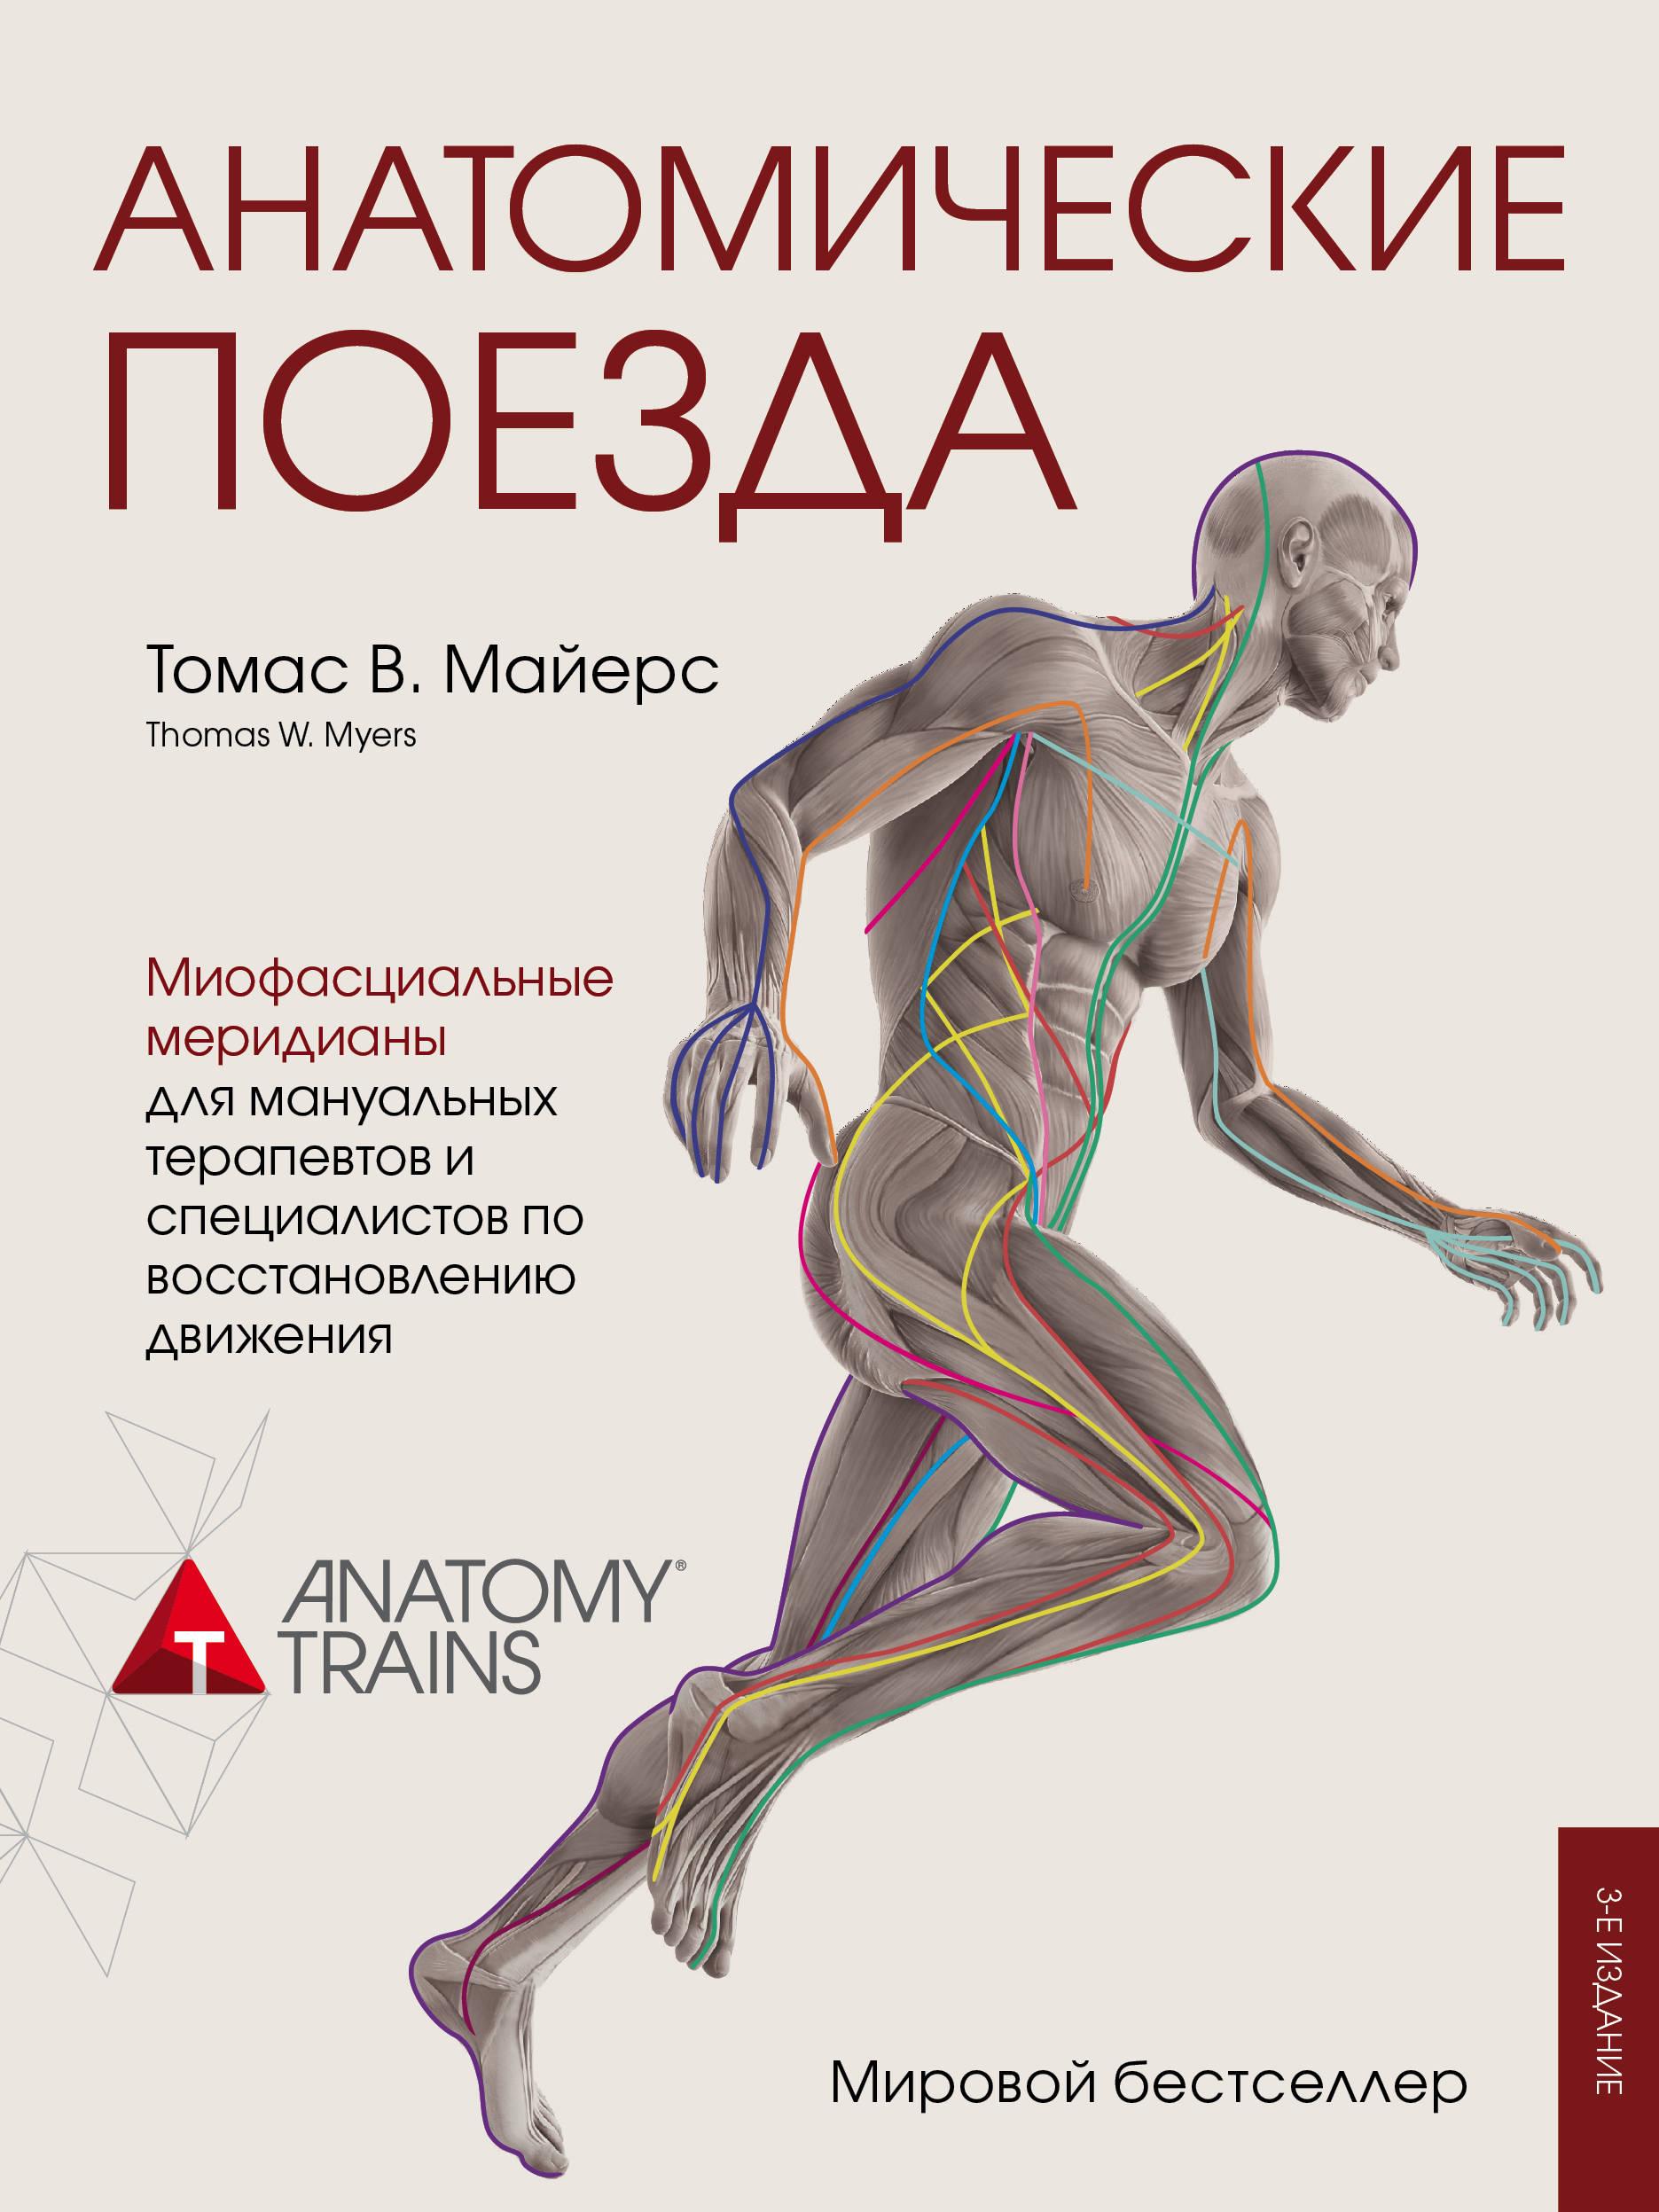 анатомия человека атлас раскраска